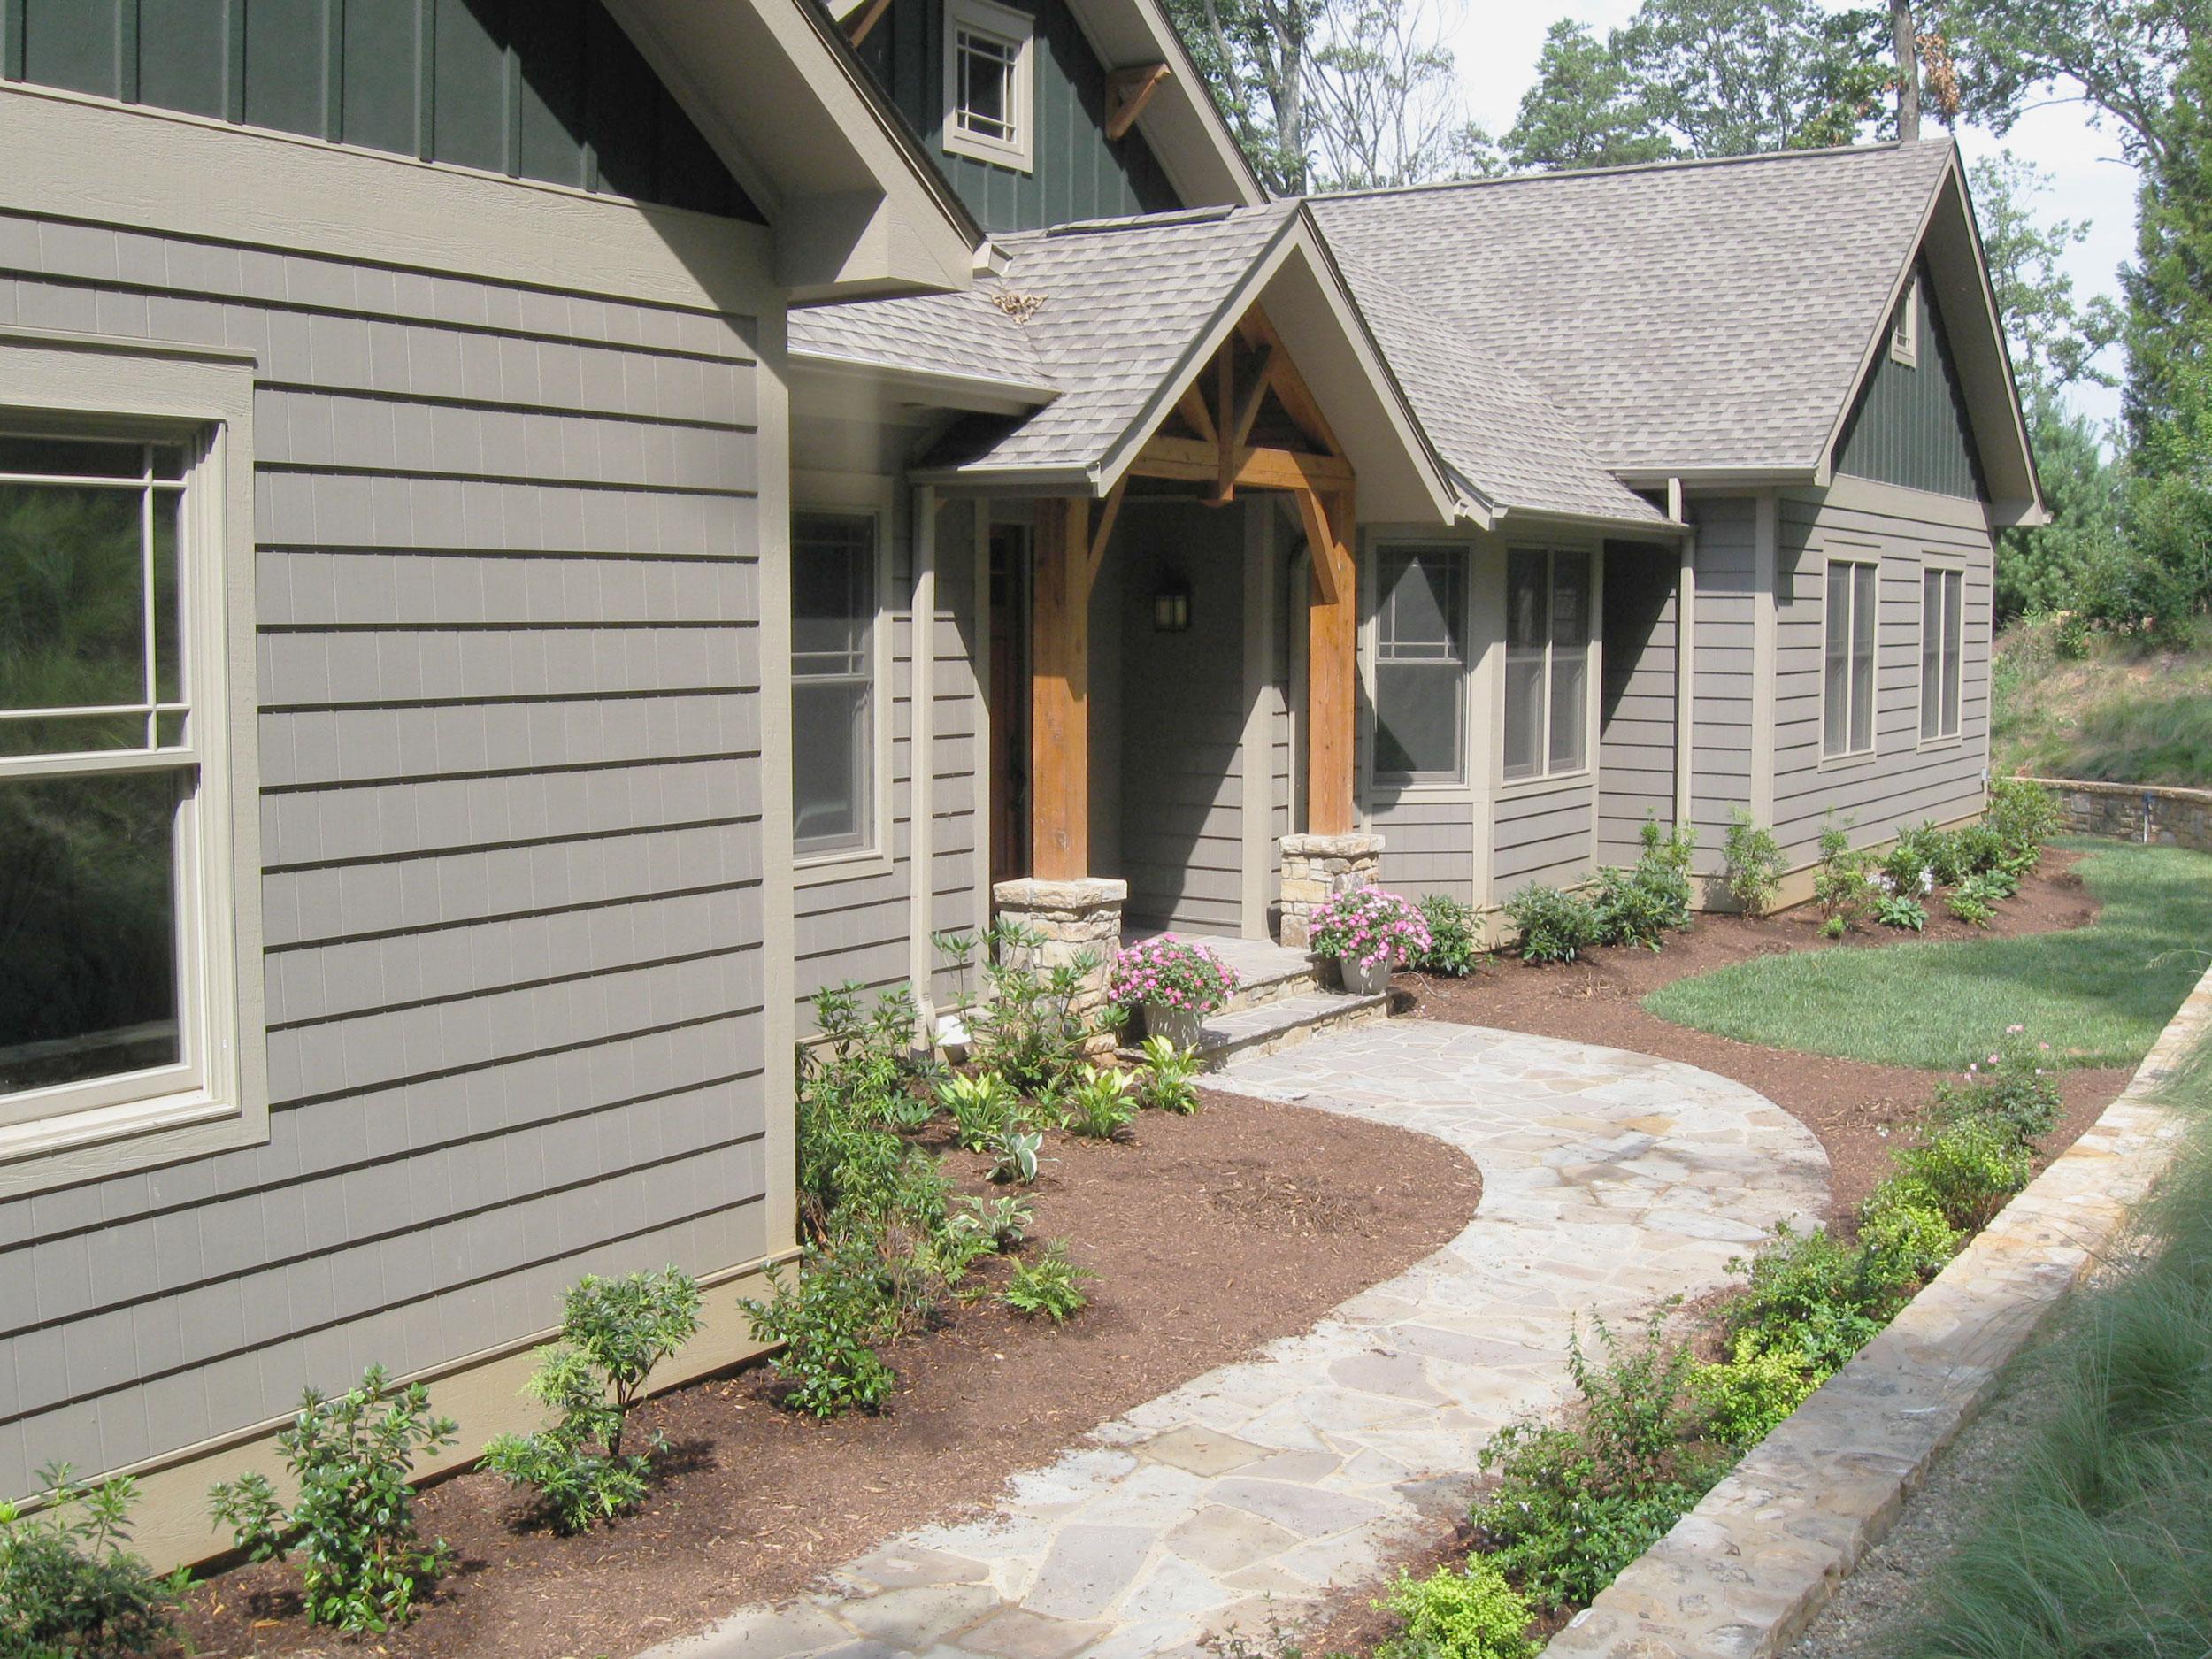 asheville-craftsman-dream-home.jpg